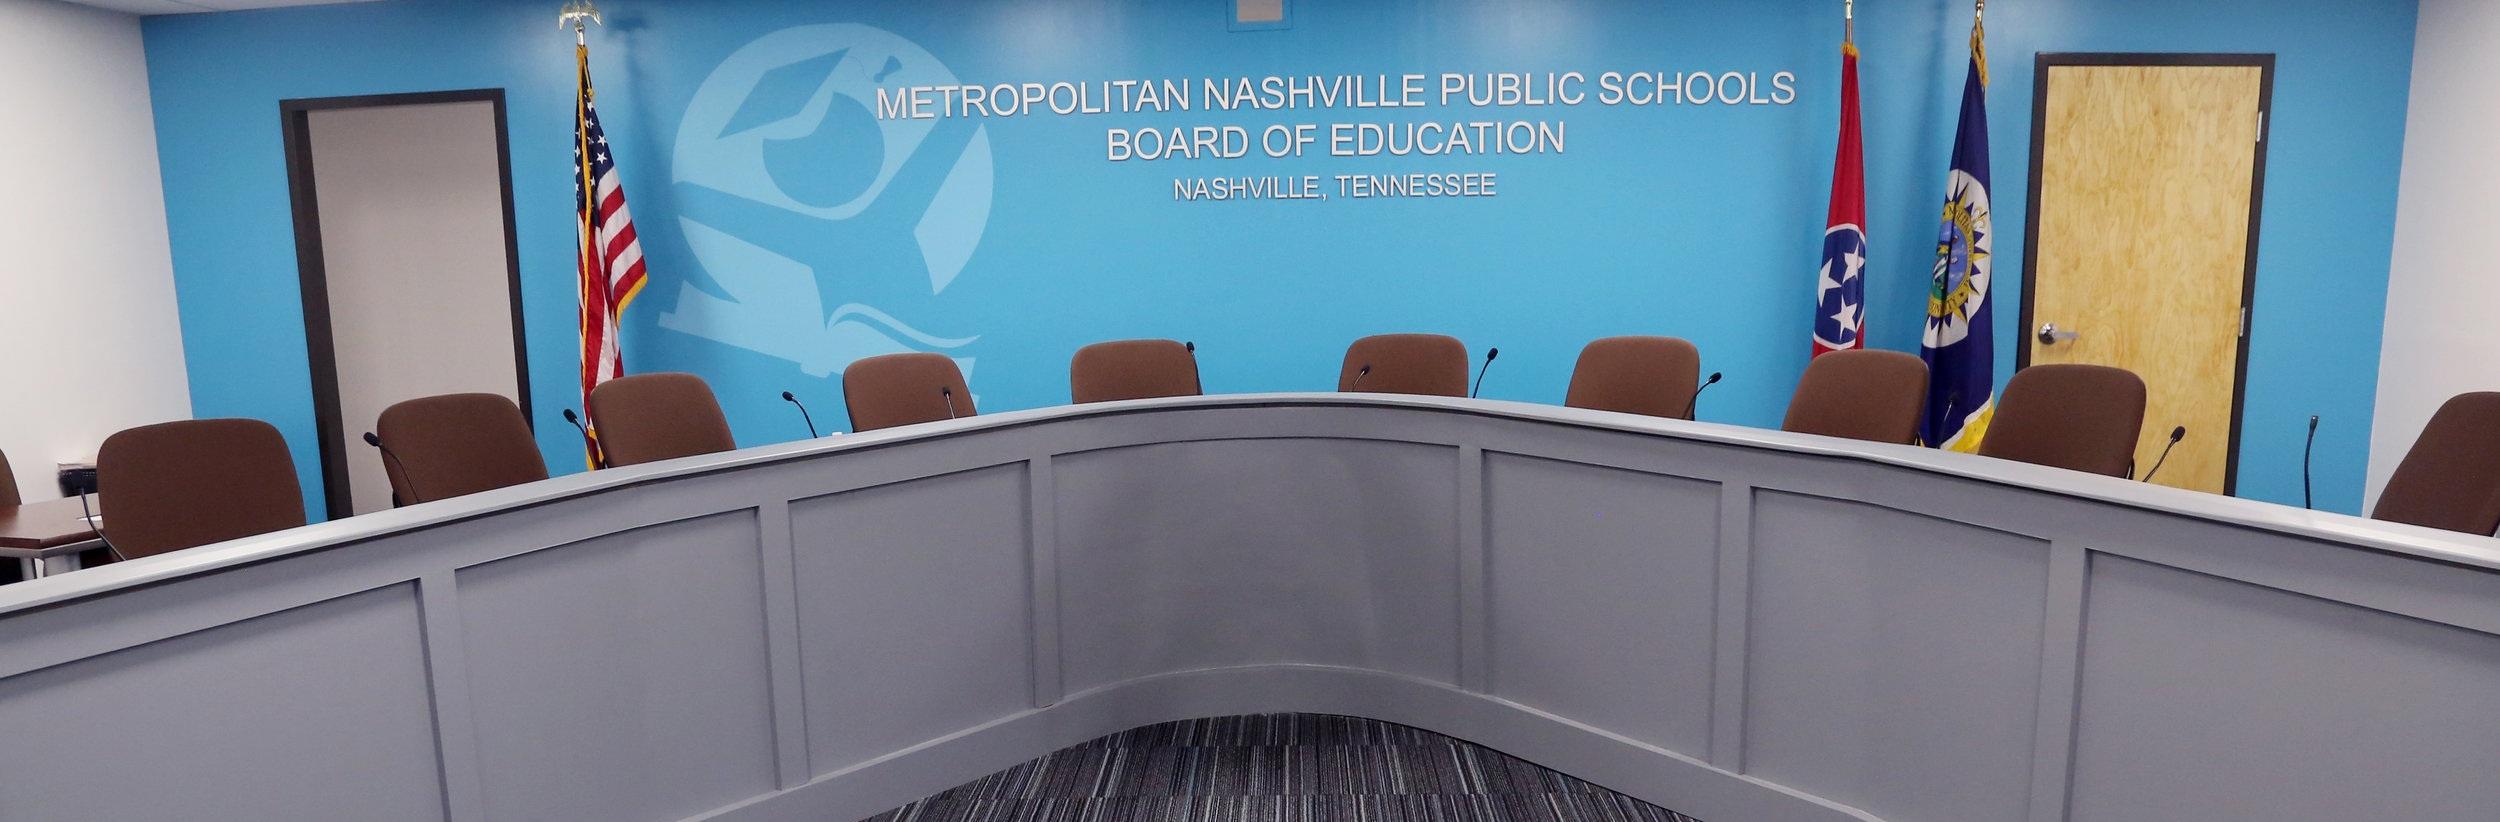 Mnps Calendar 2016 2020 Board of Education — Metro Nashville Public Schools